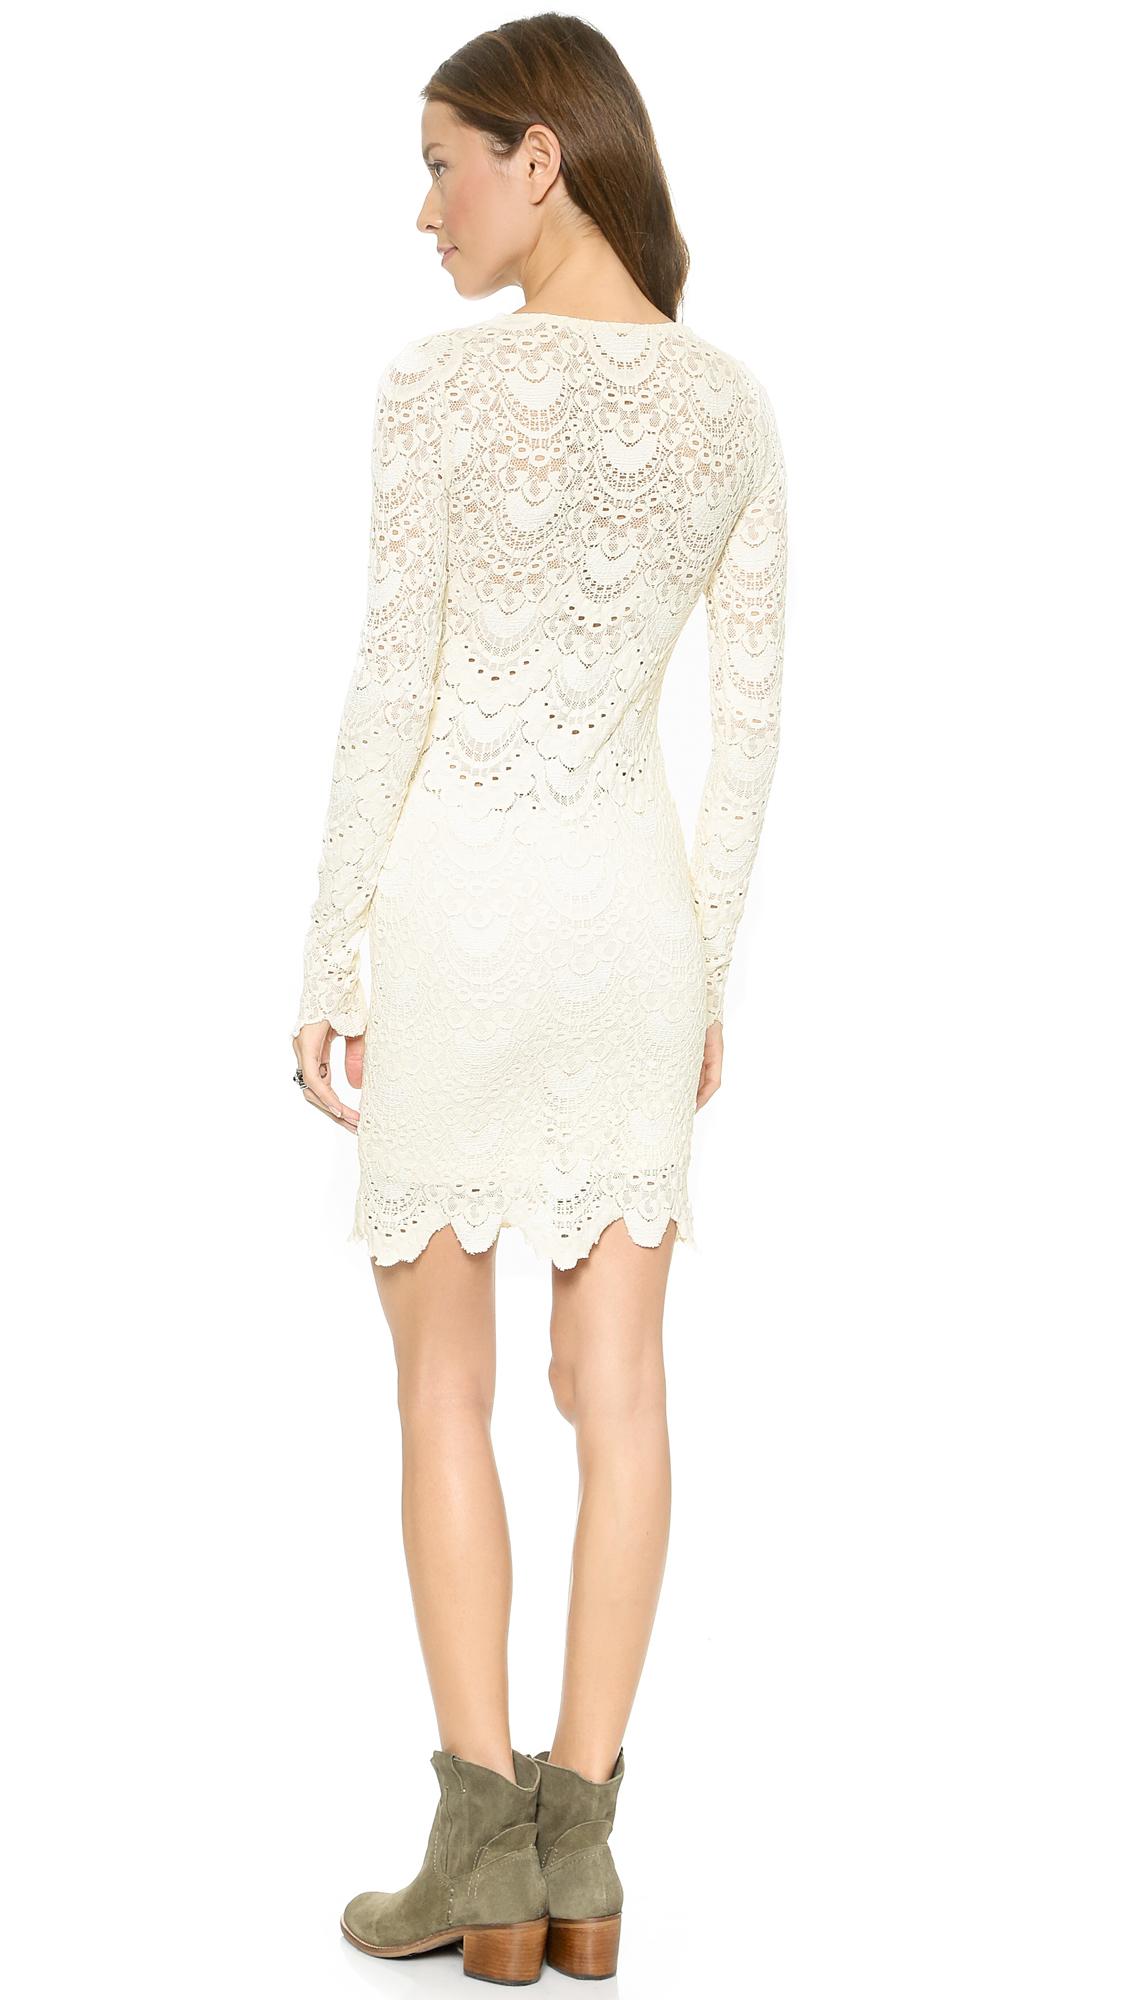 ba4d2c0028 Lyst - Nightcap Spanish Lace Long Sleeve Deep V Dress - Ivory in White